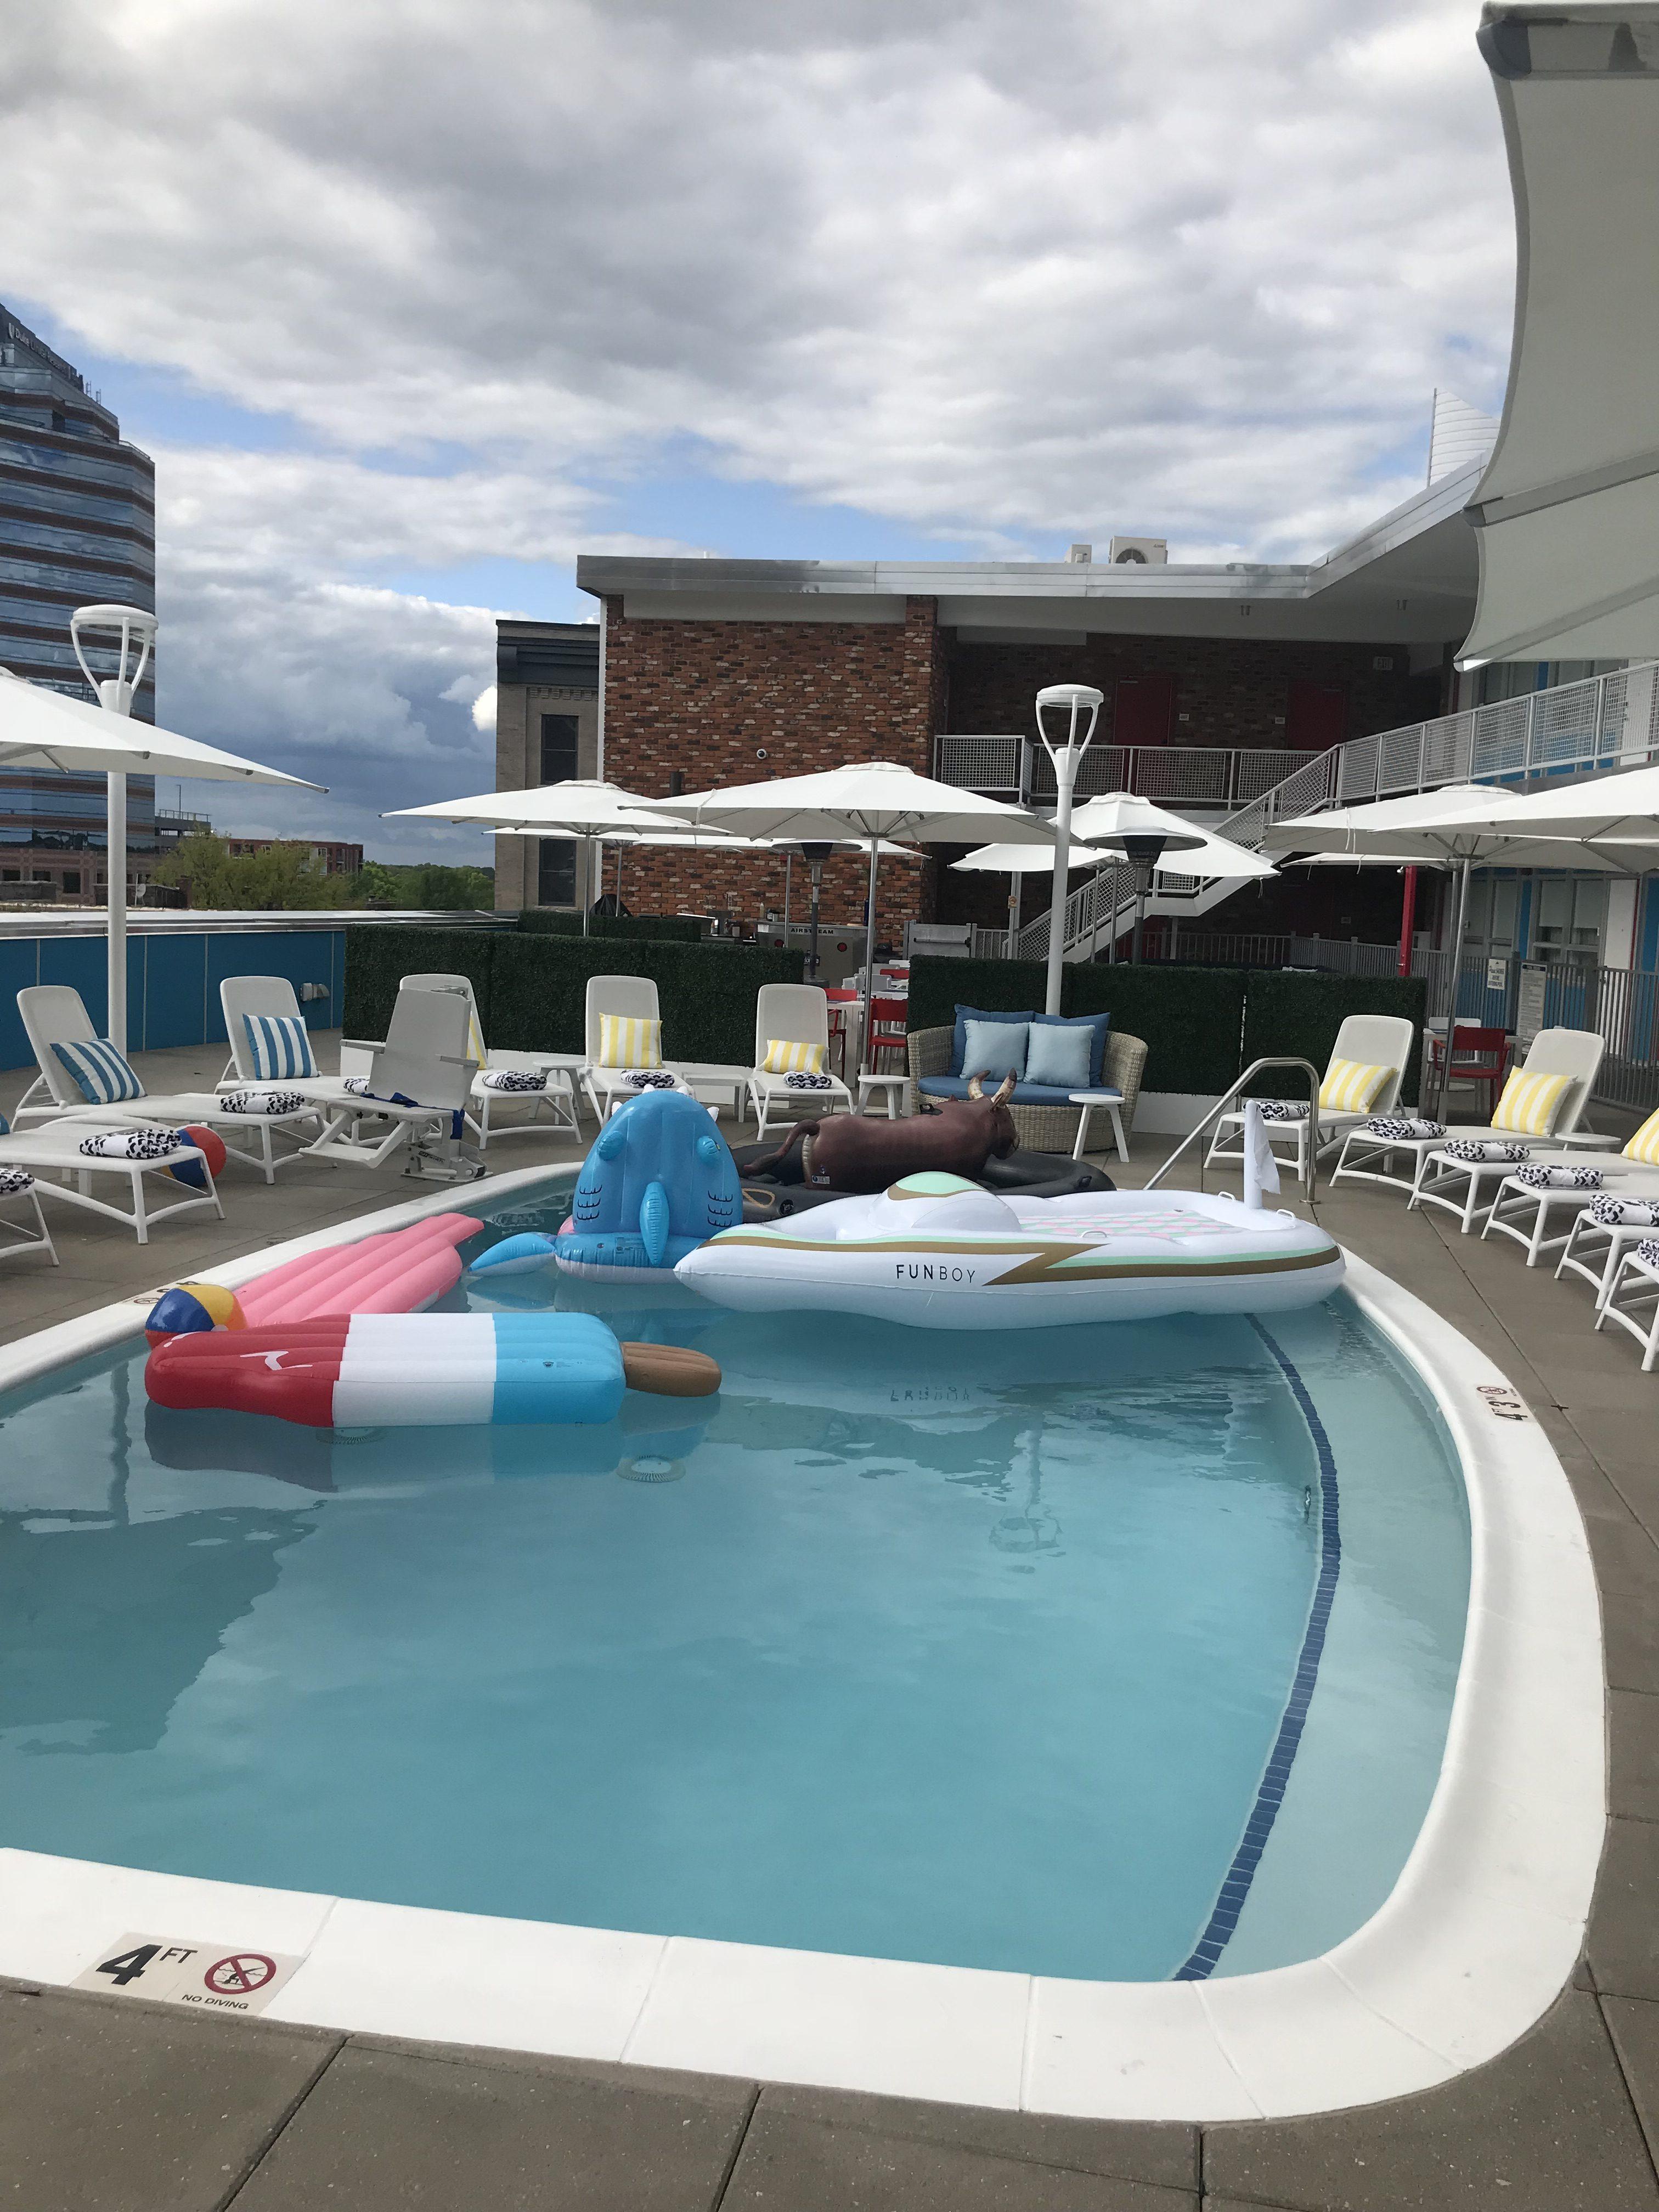 Durham, North Carolina for cheap bachelor party destinations